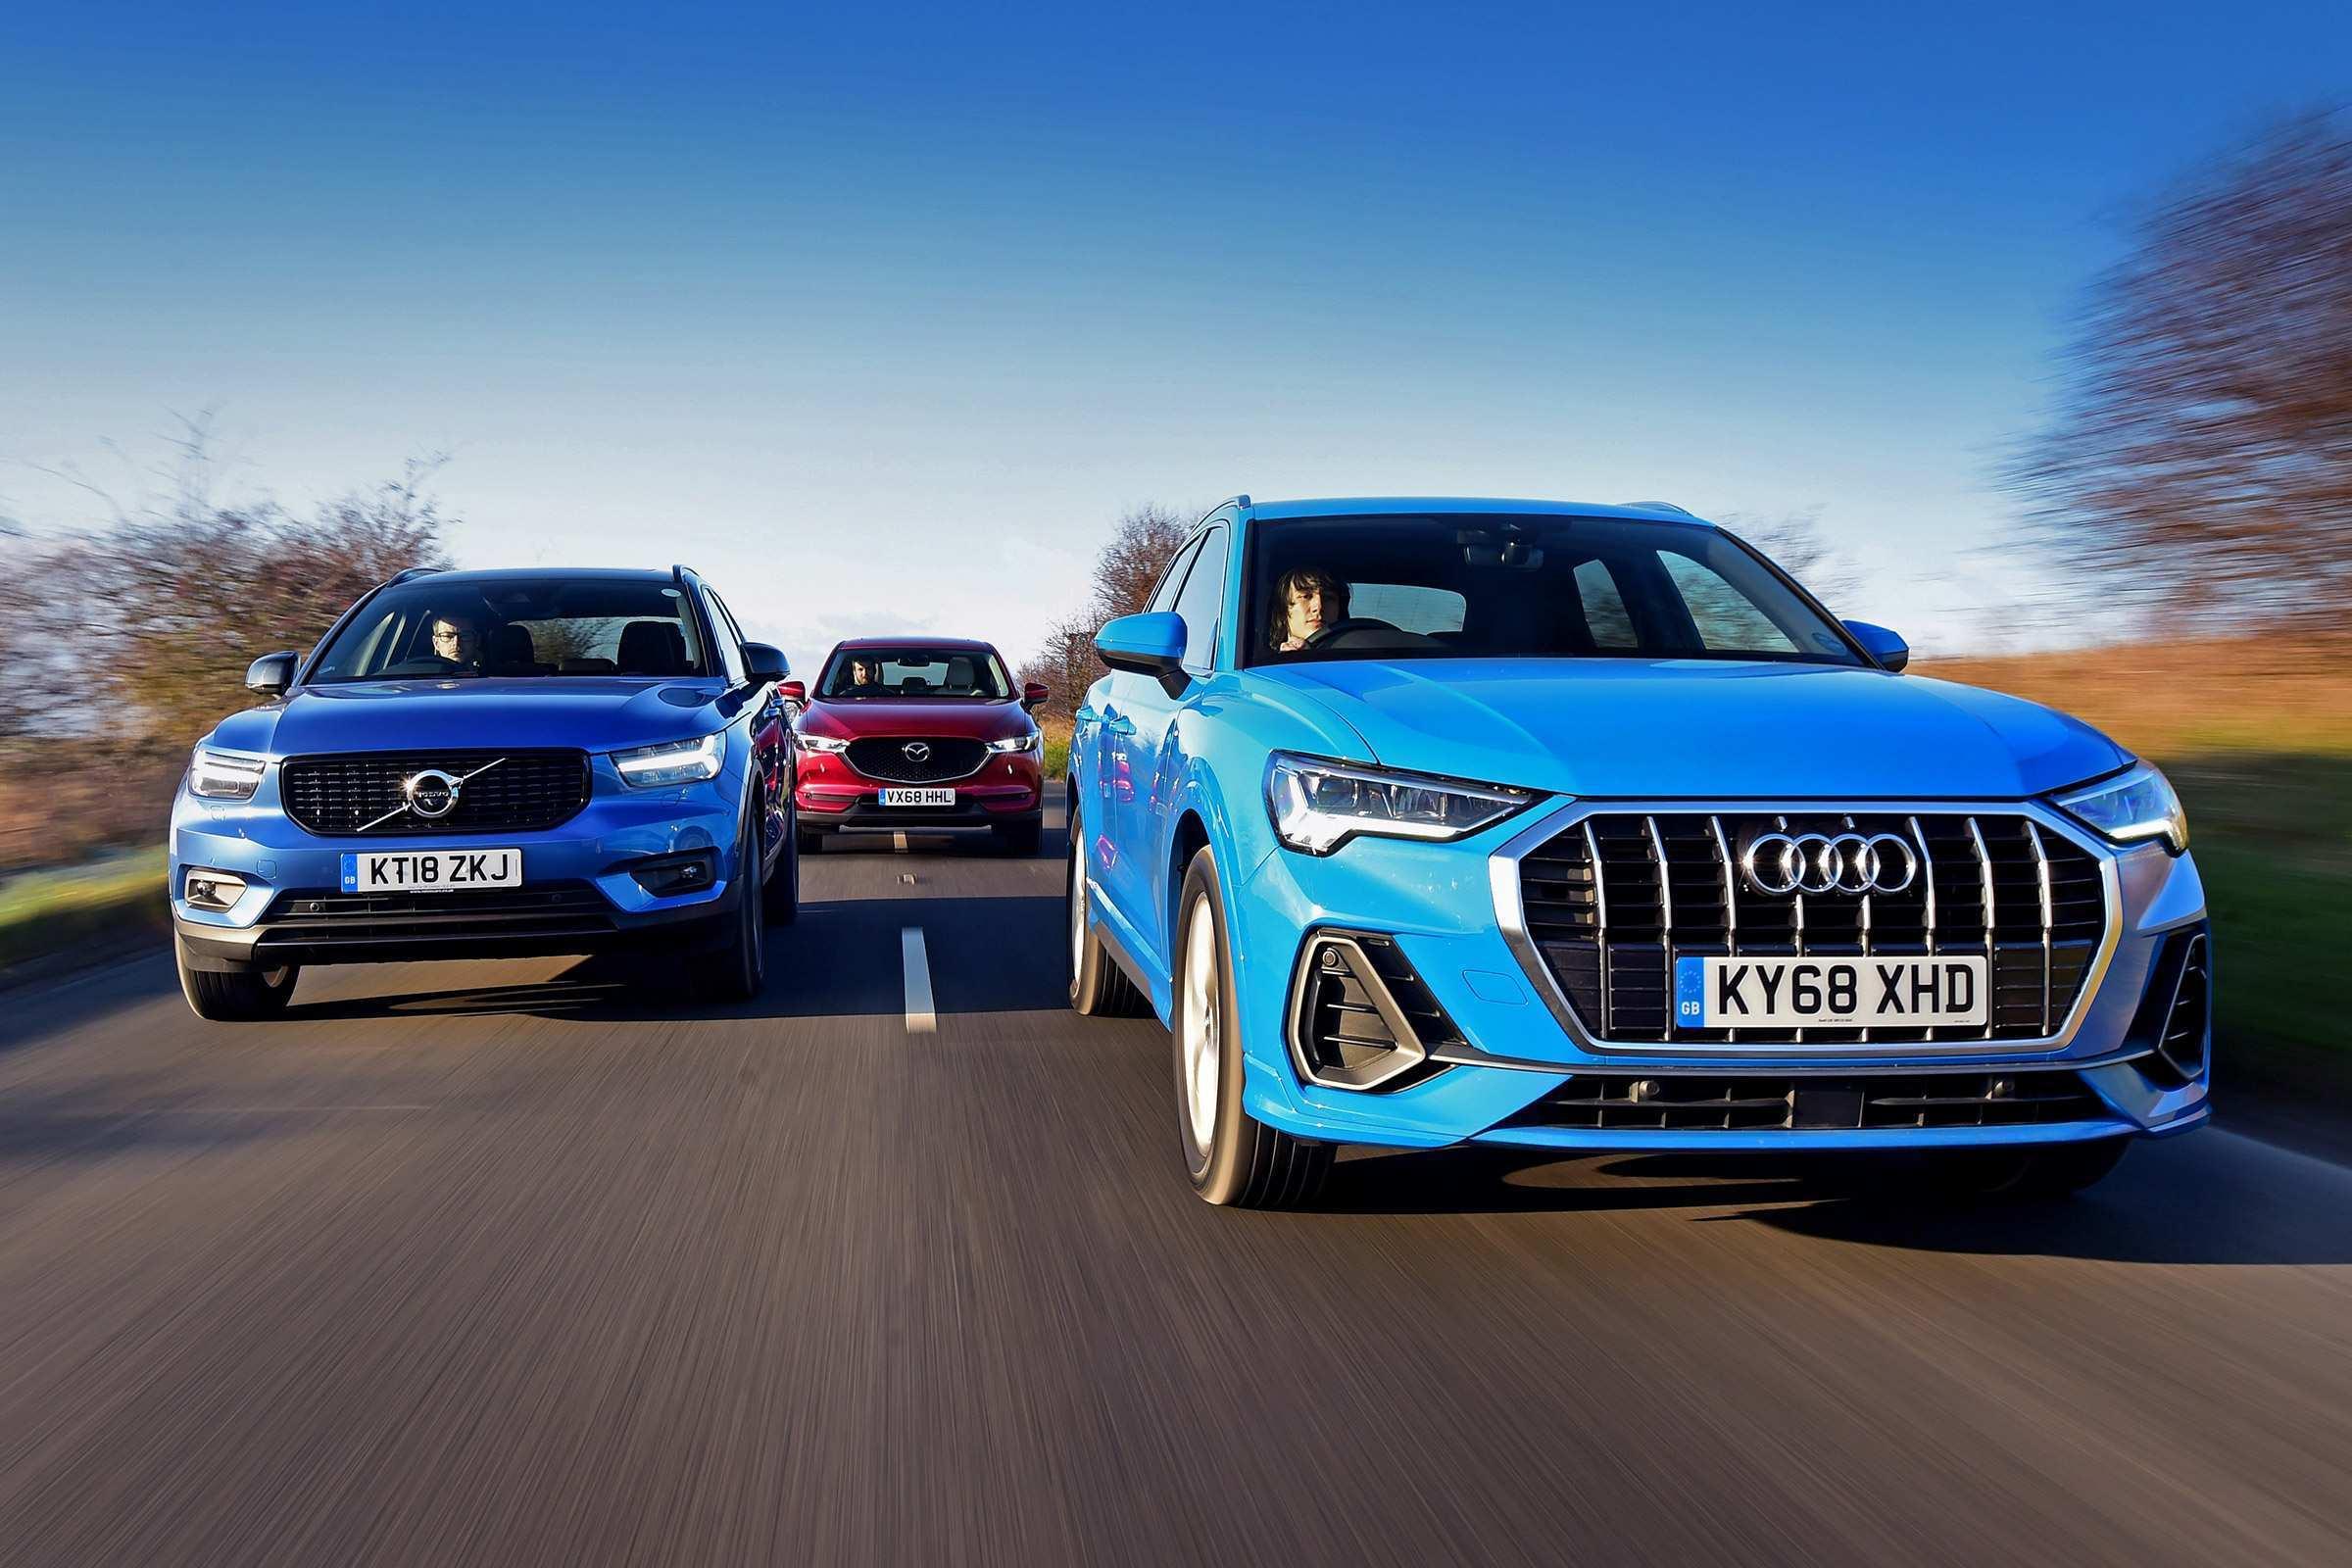 67 New 2019 Audi Q3 Vs Volvo Xc40 Release Date Exterior and Interior with 2019 Audi Q3 Vs Volvo Xc40 Release Date